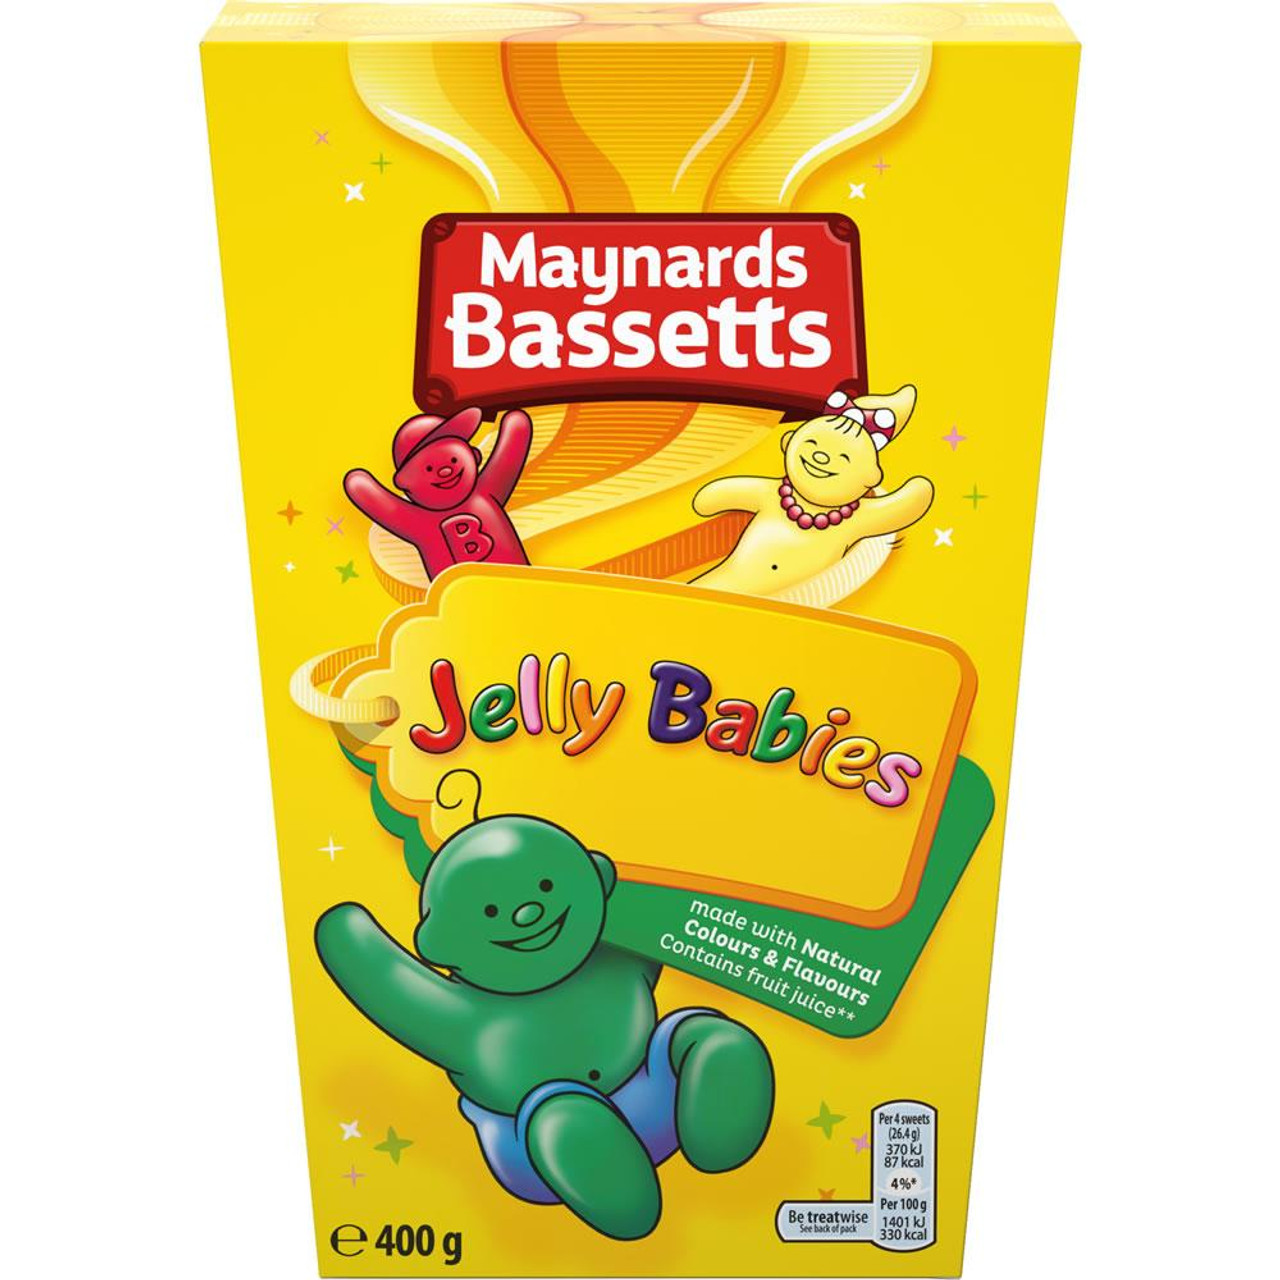 Maynards Bassetts - Jelly Babies, 400g carton